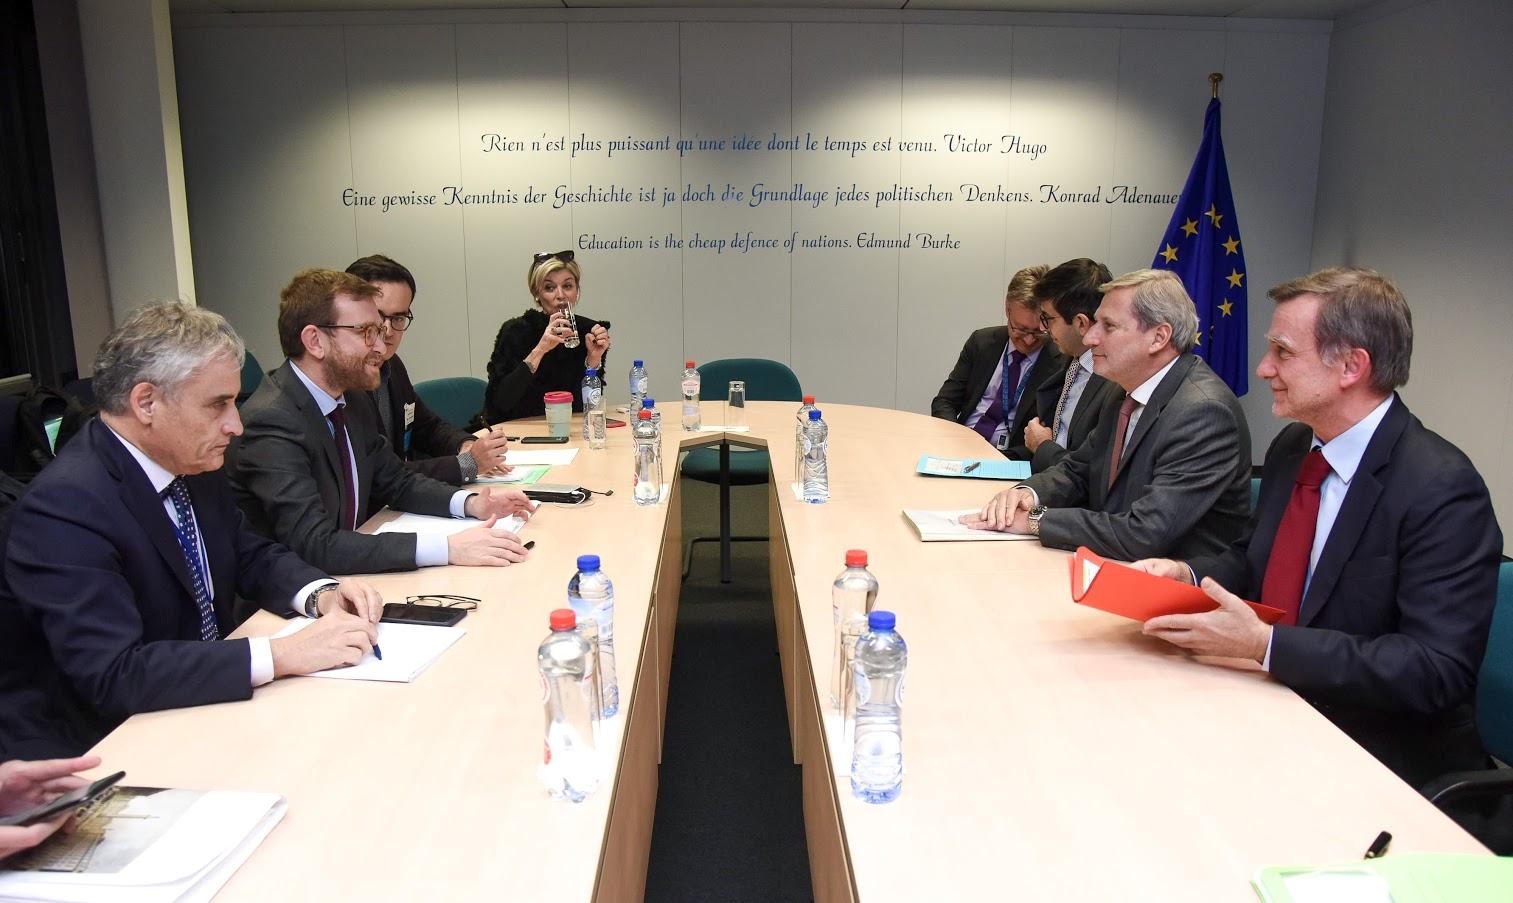 Provenzano a Bruxelles - Photo credit: European Union, 2019 - Photographer: Jennifer Jacquemart